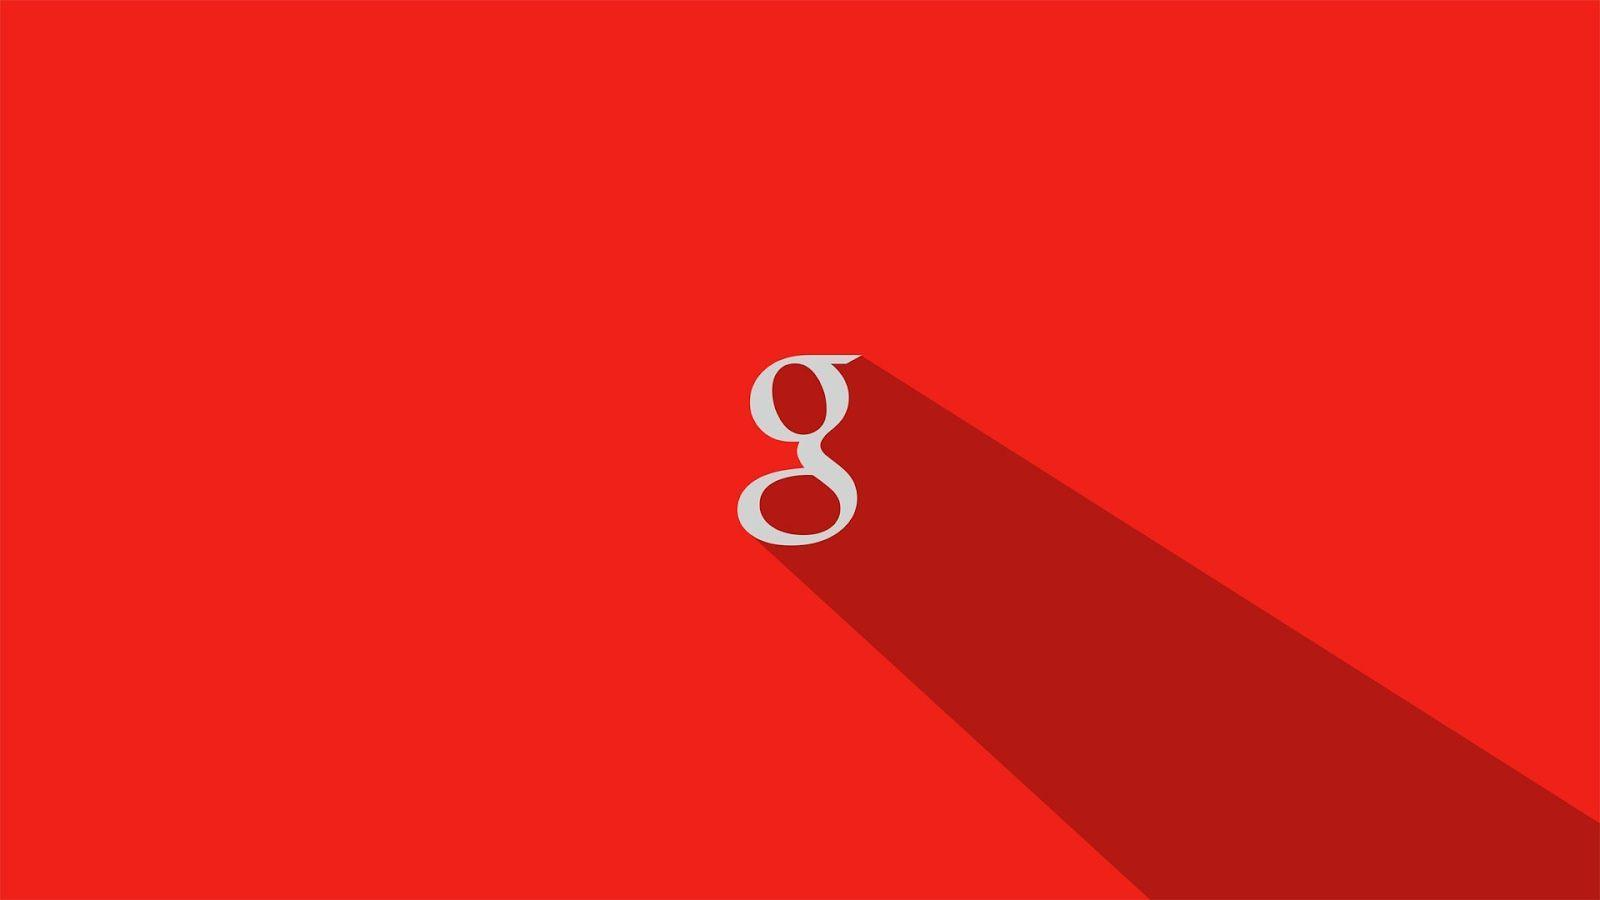 Gmail Wallpaper Size